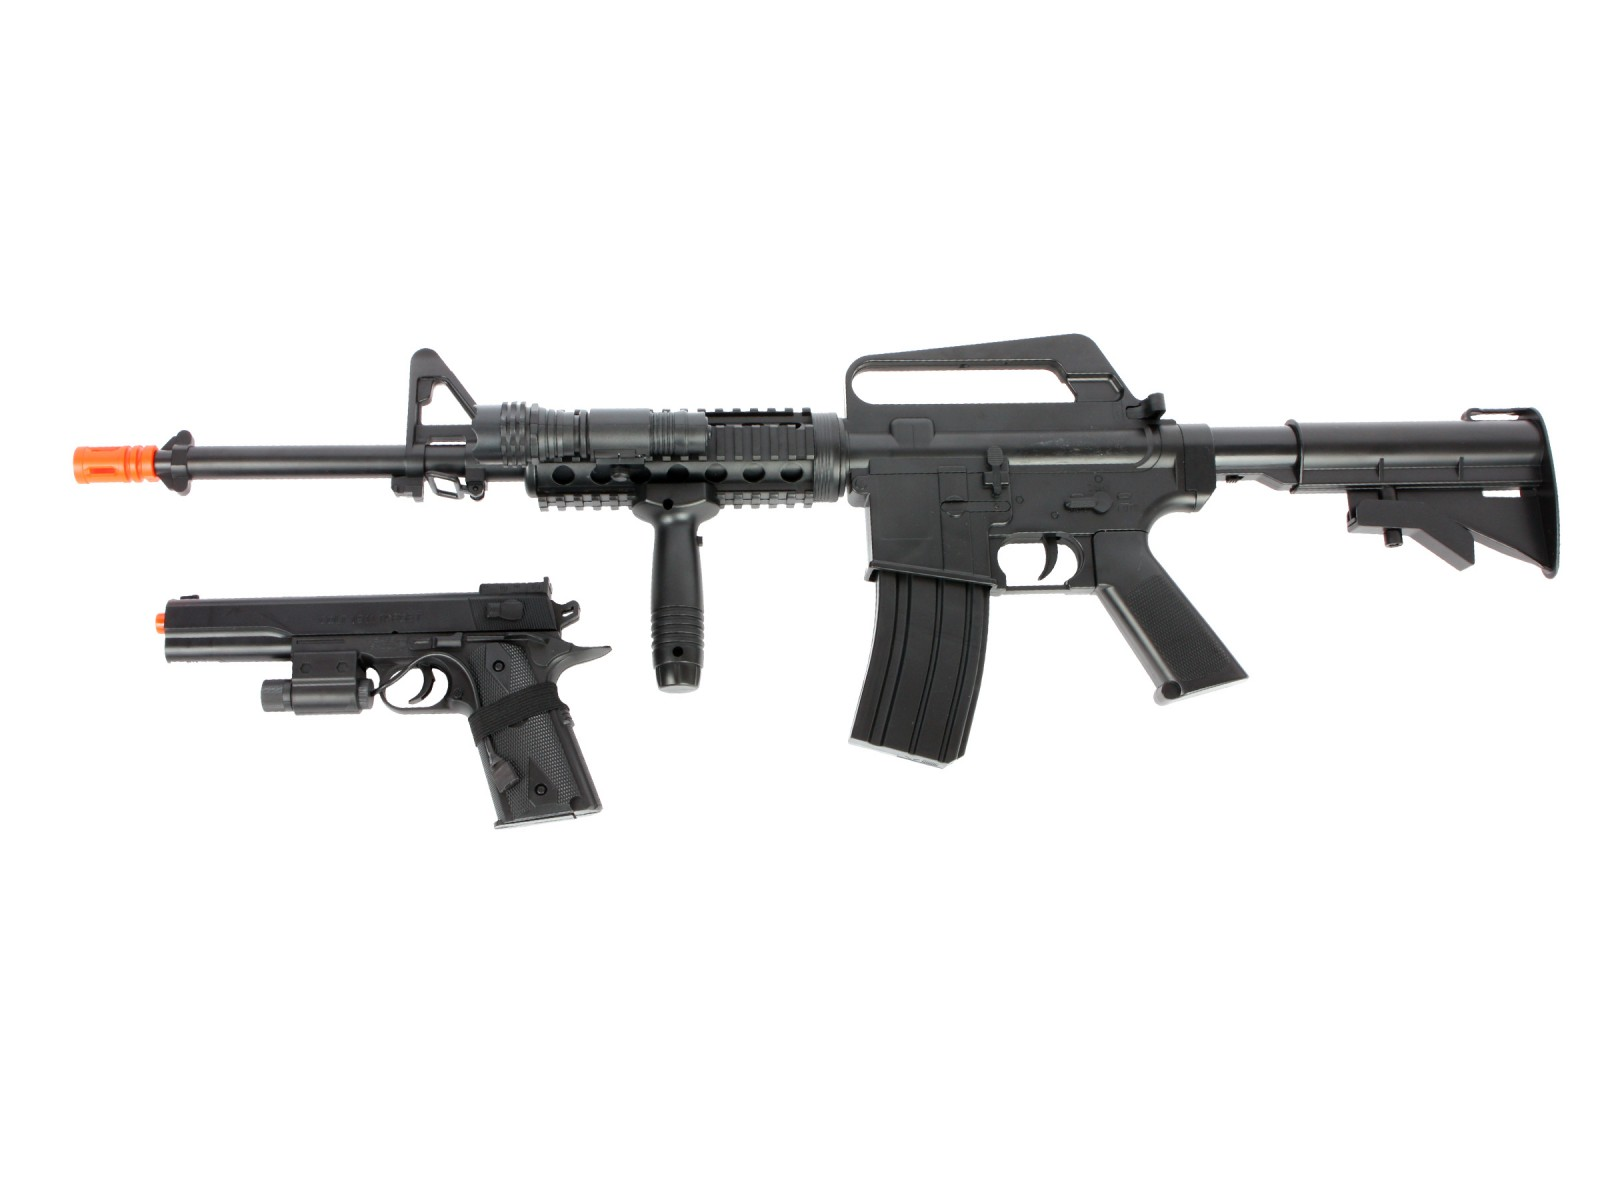 Colt_M4_On_Duty_Spring_Airsoft_Kit_Black_6mm